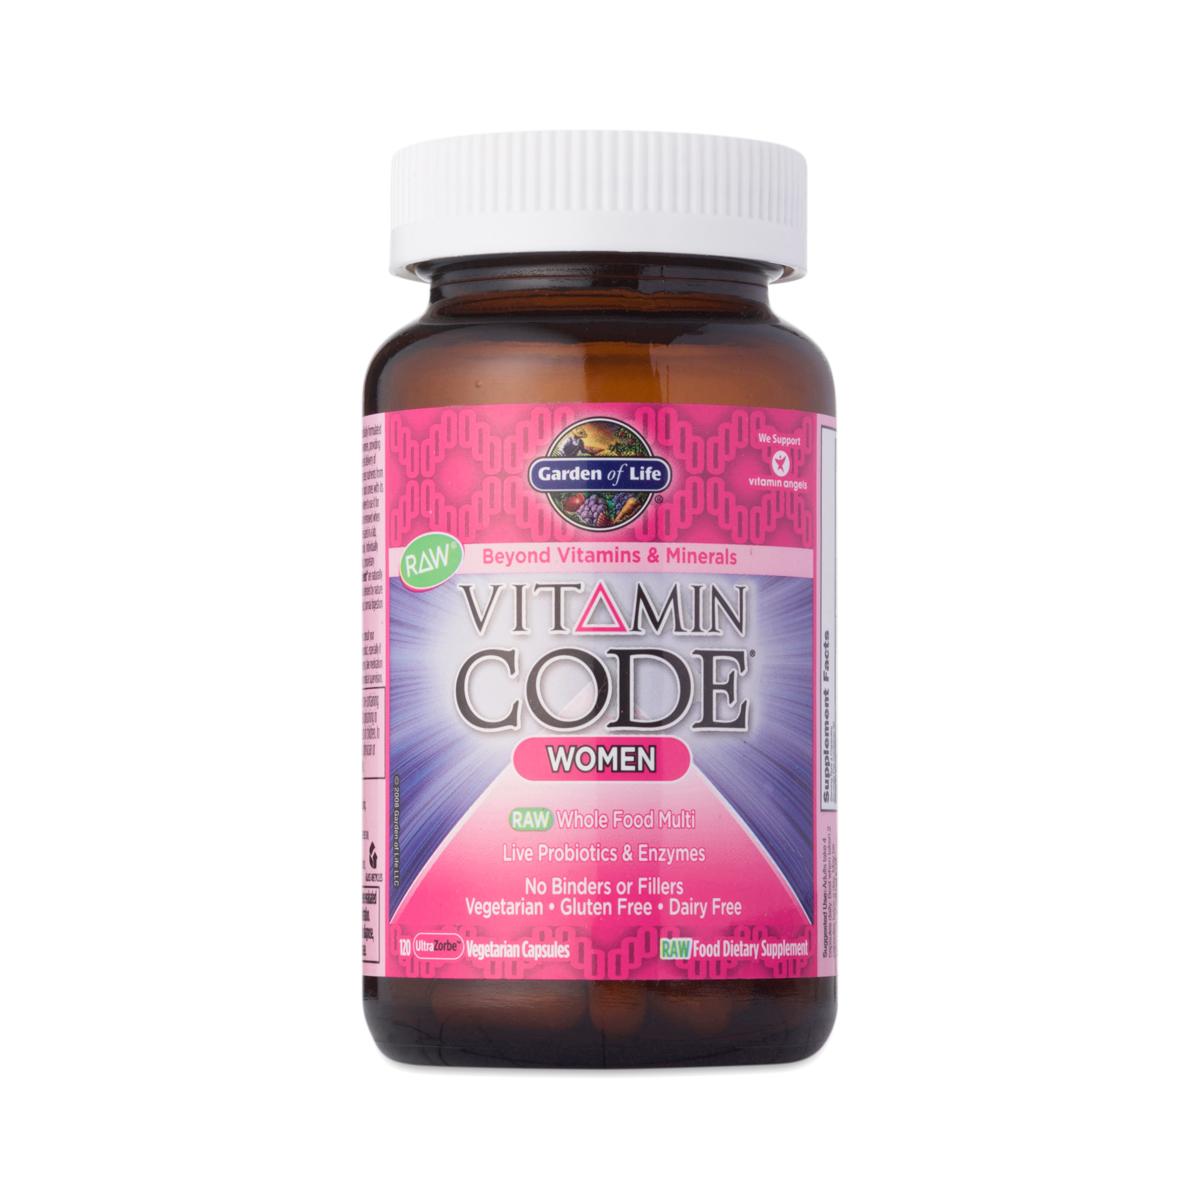 Vitamin Code Women 39 S Multivitamin By Garden Of Life Thrive Market